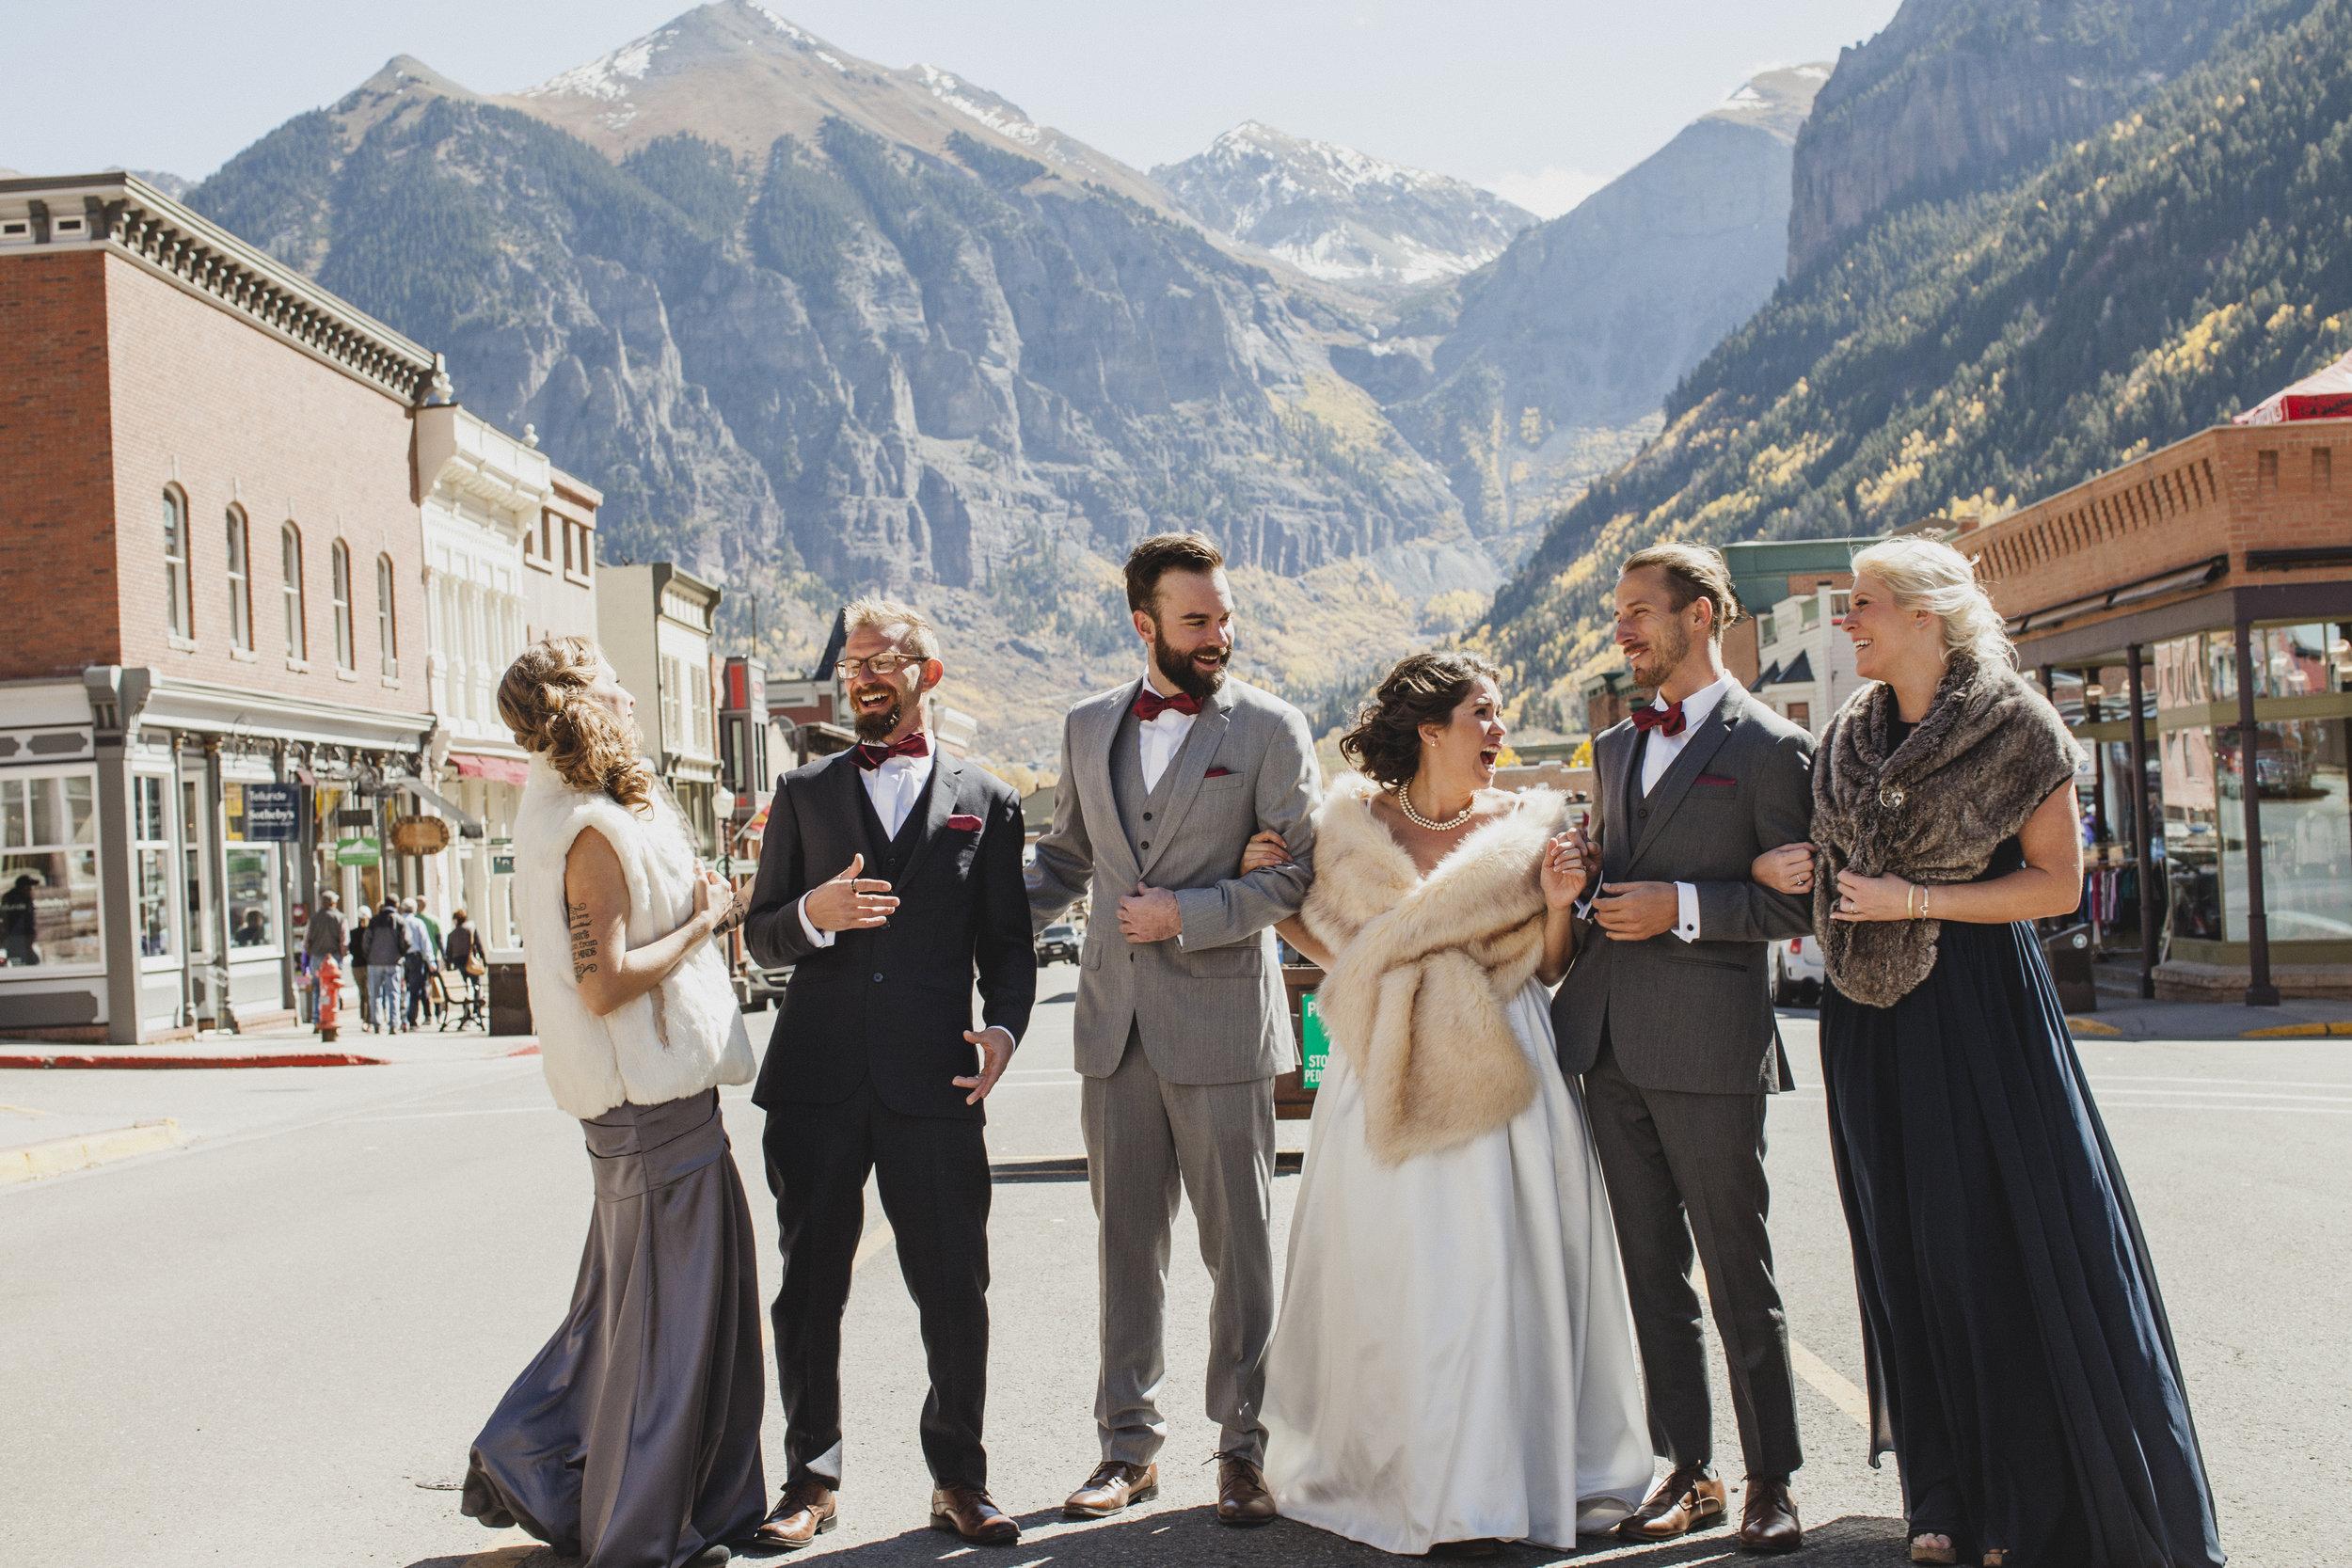 NE-LeahandAshtonphotography-Telluride-Wedding-Photography-6569.jpg